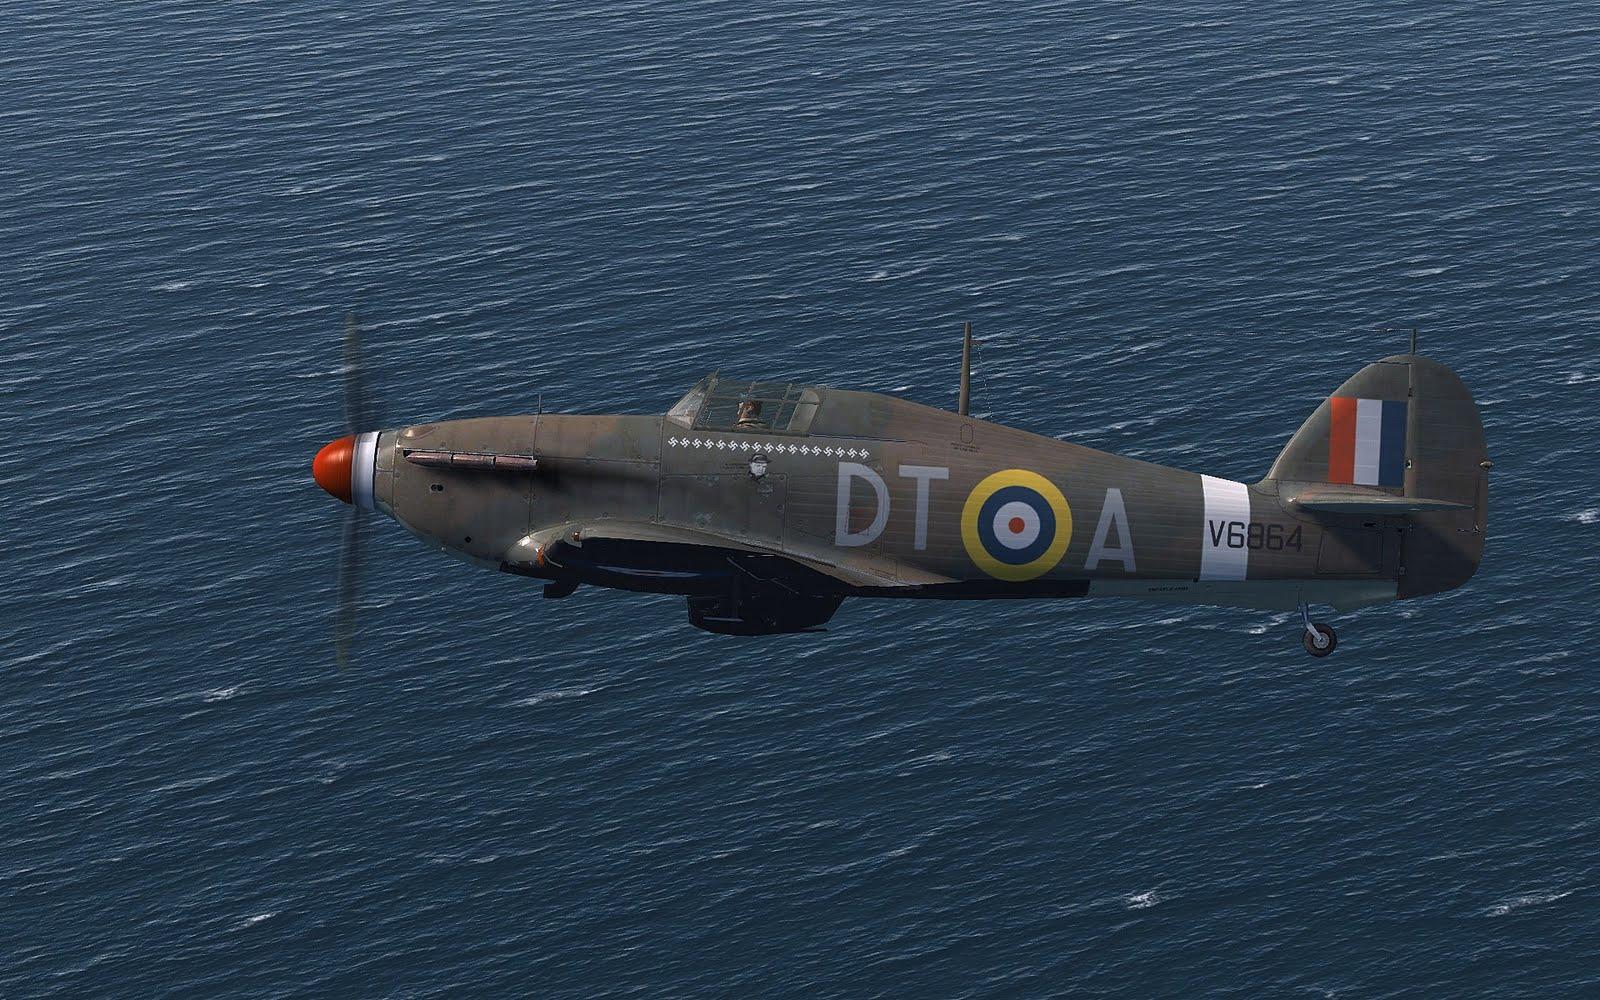 COD SO Hurricane I RAF 277Sqn DTA Stanford Tuck V6864 England 1941 V0A